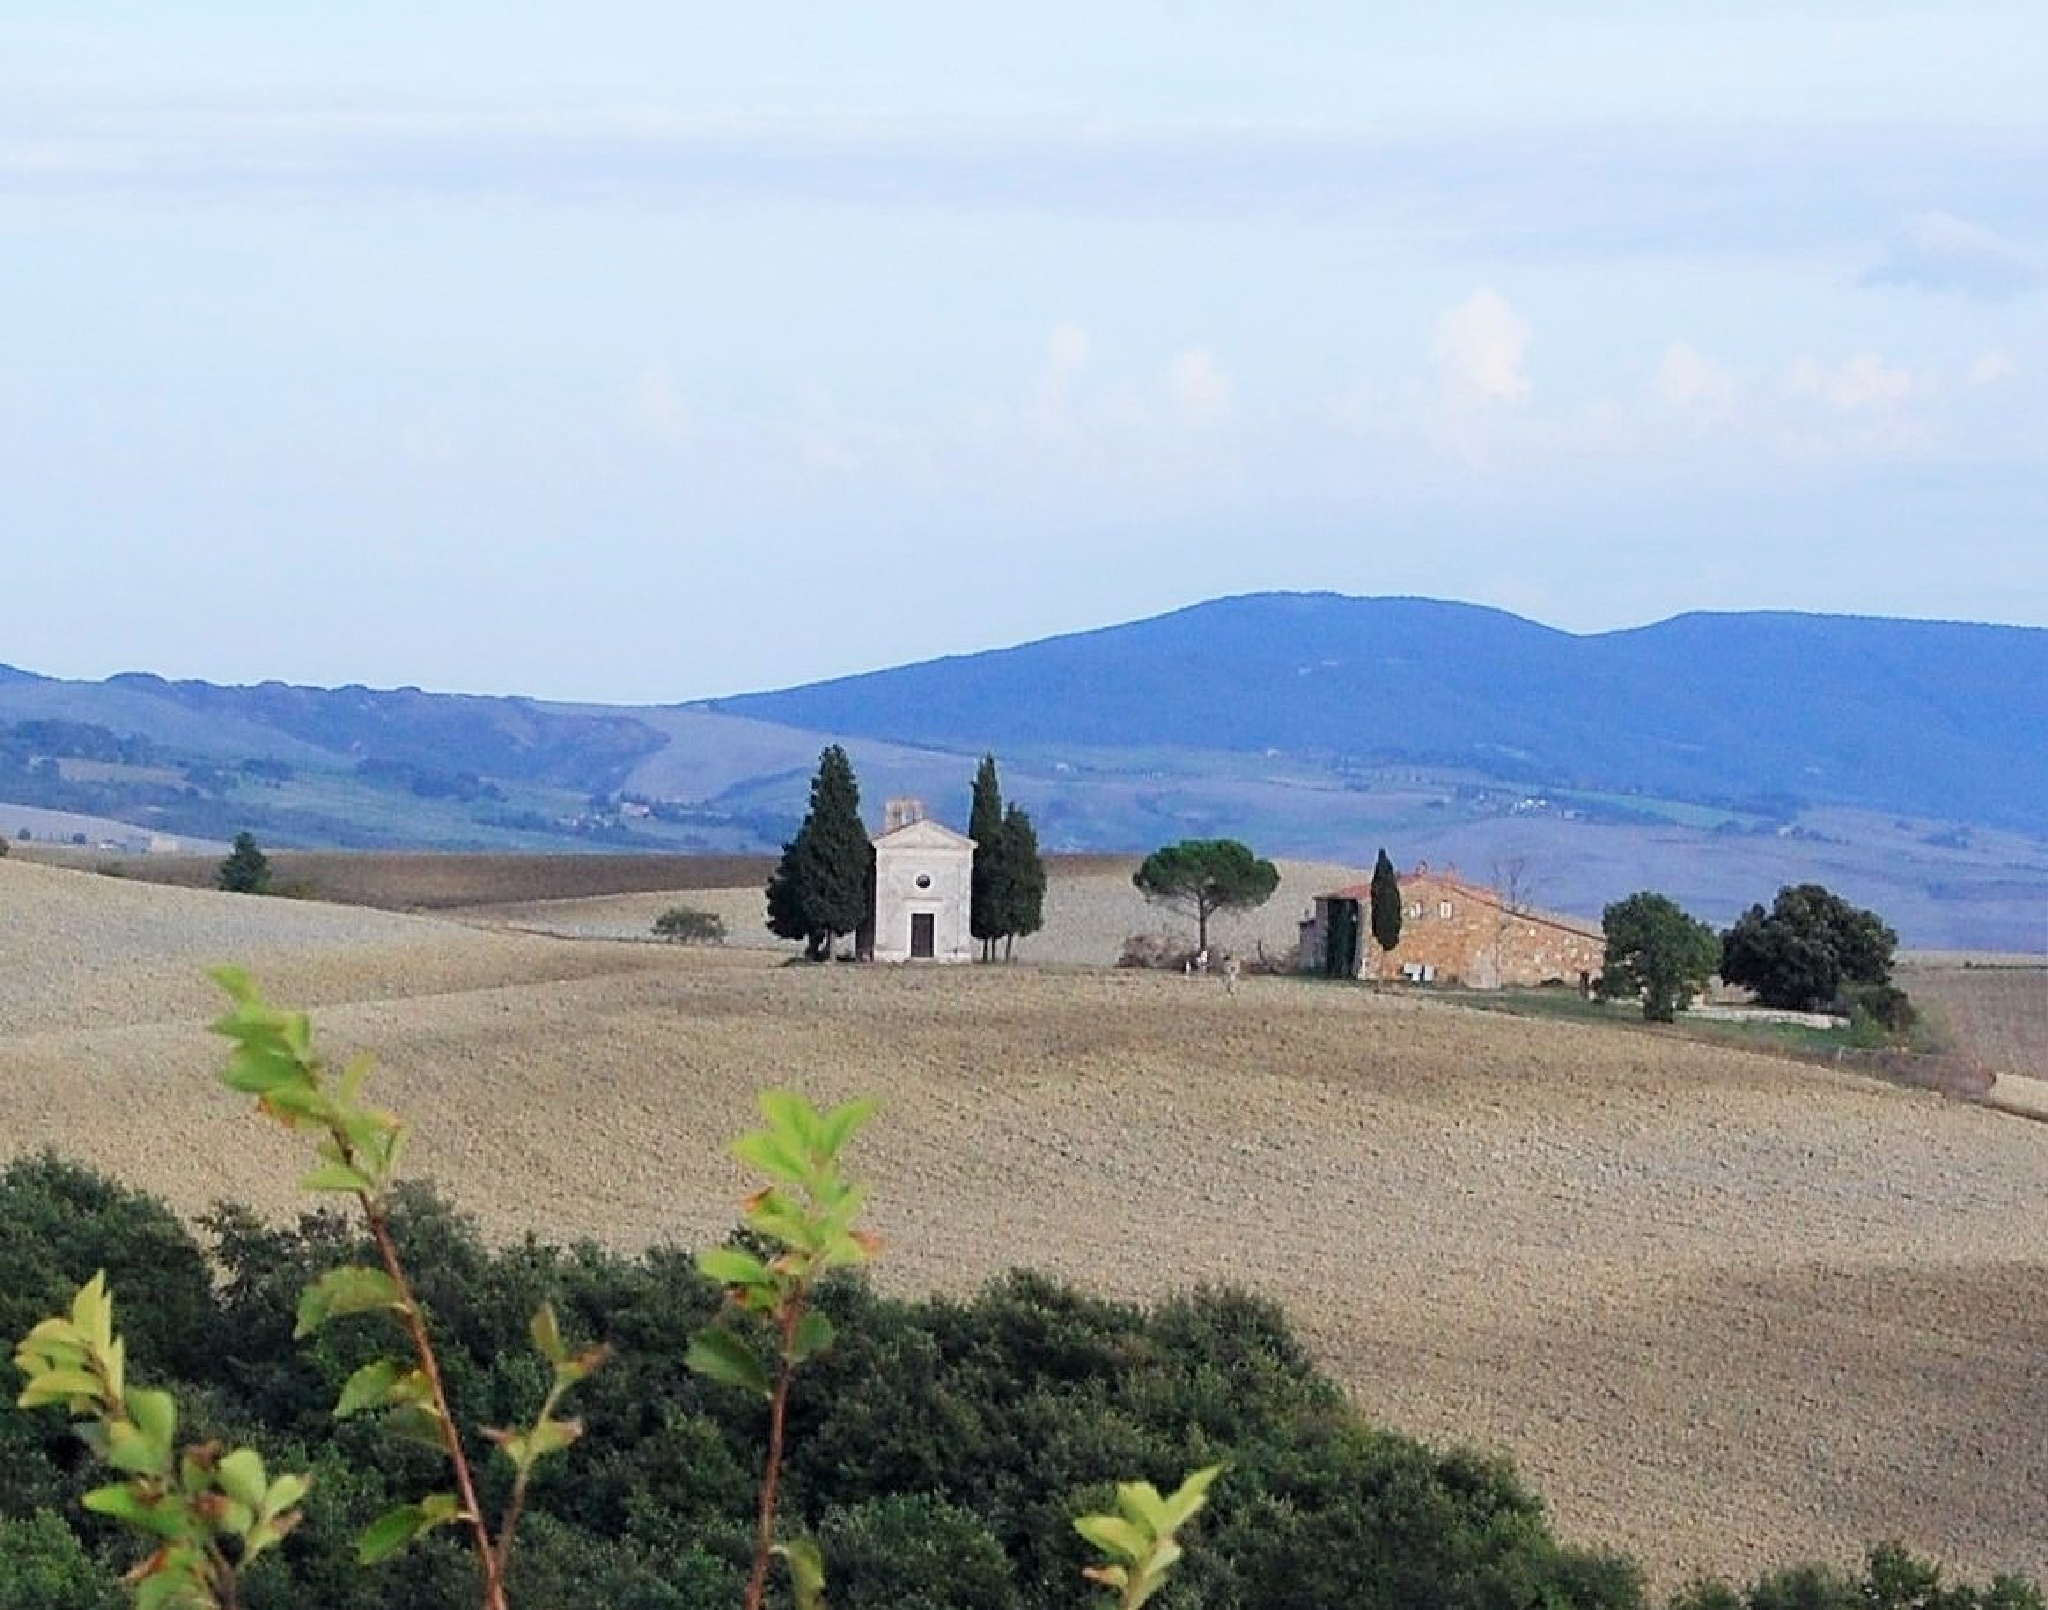 For me is this Toscana by lillemor.ekstrom ek